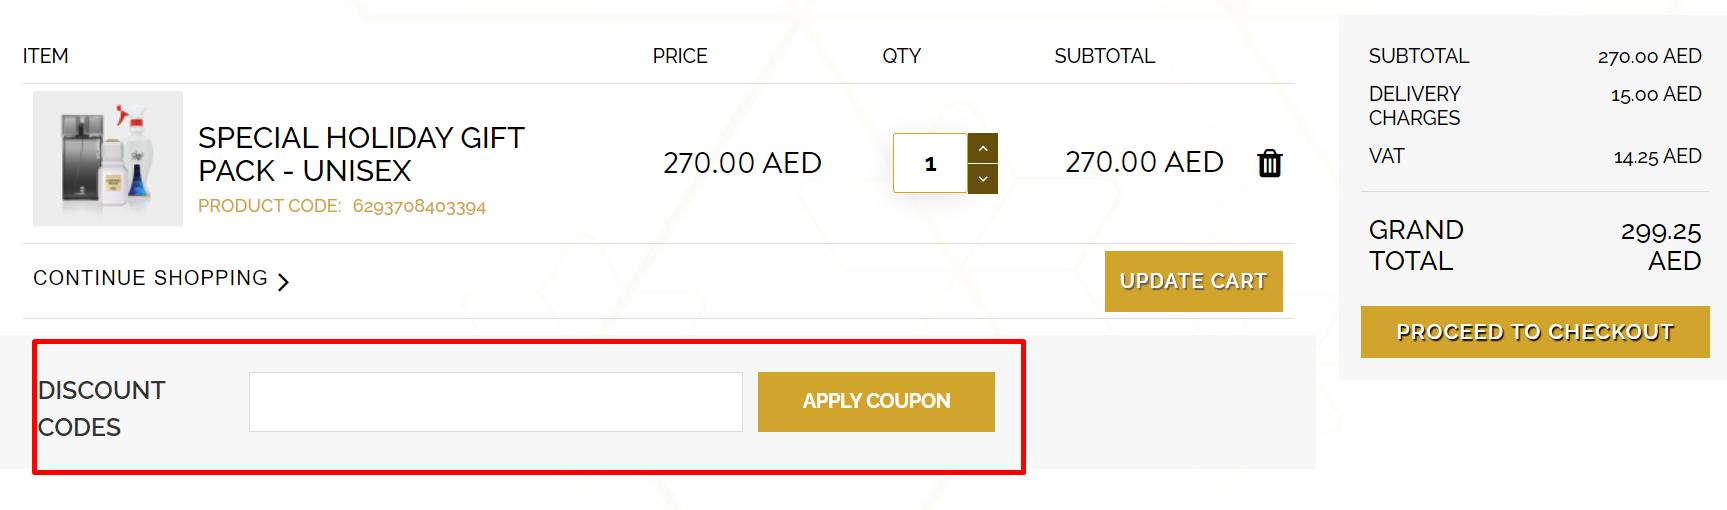 How do I use my Ajmal discount code?